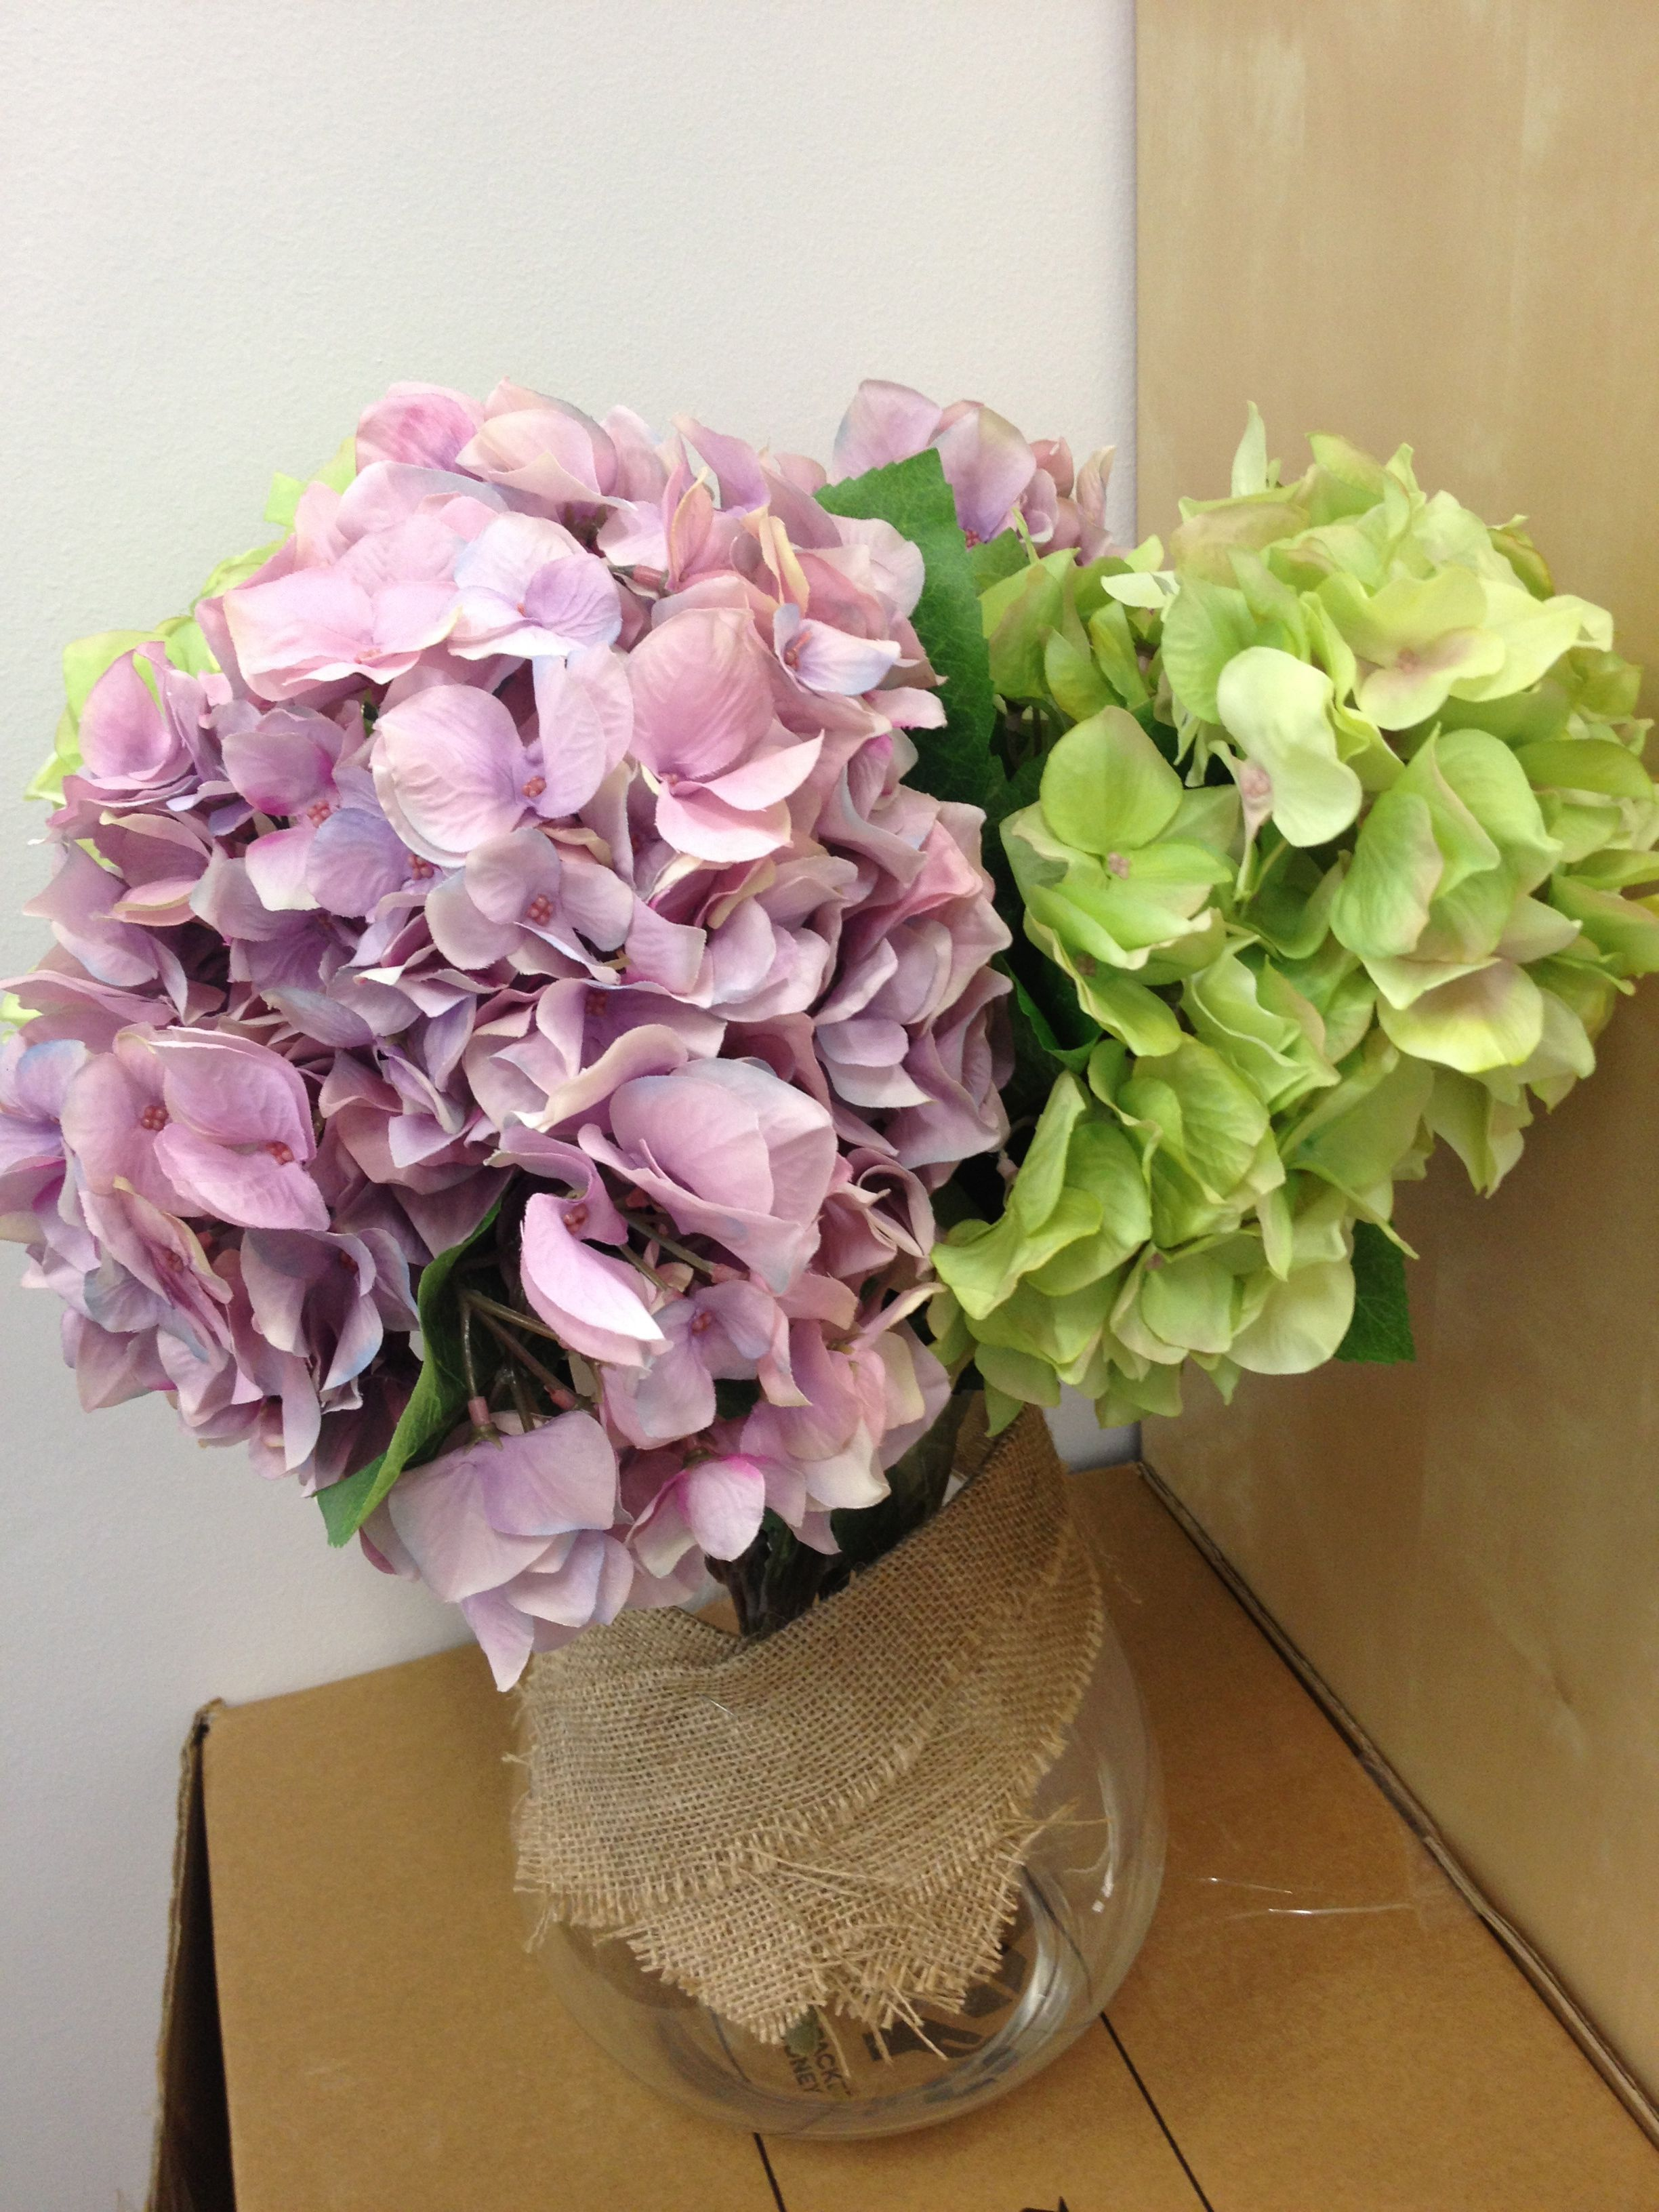 Wedding decorations home  Hydrangea Pink u Green Good for outdoor wedding decorations  home